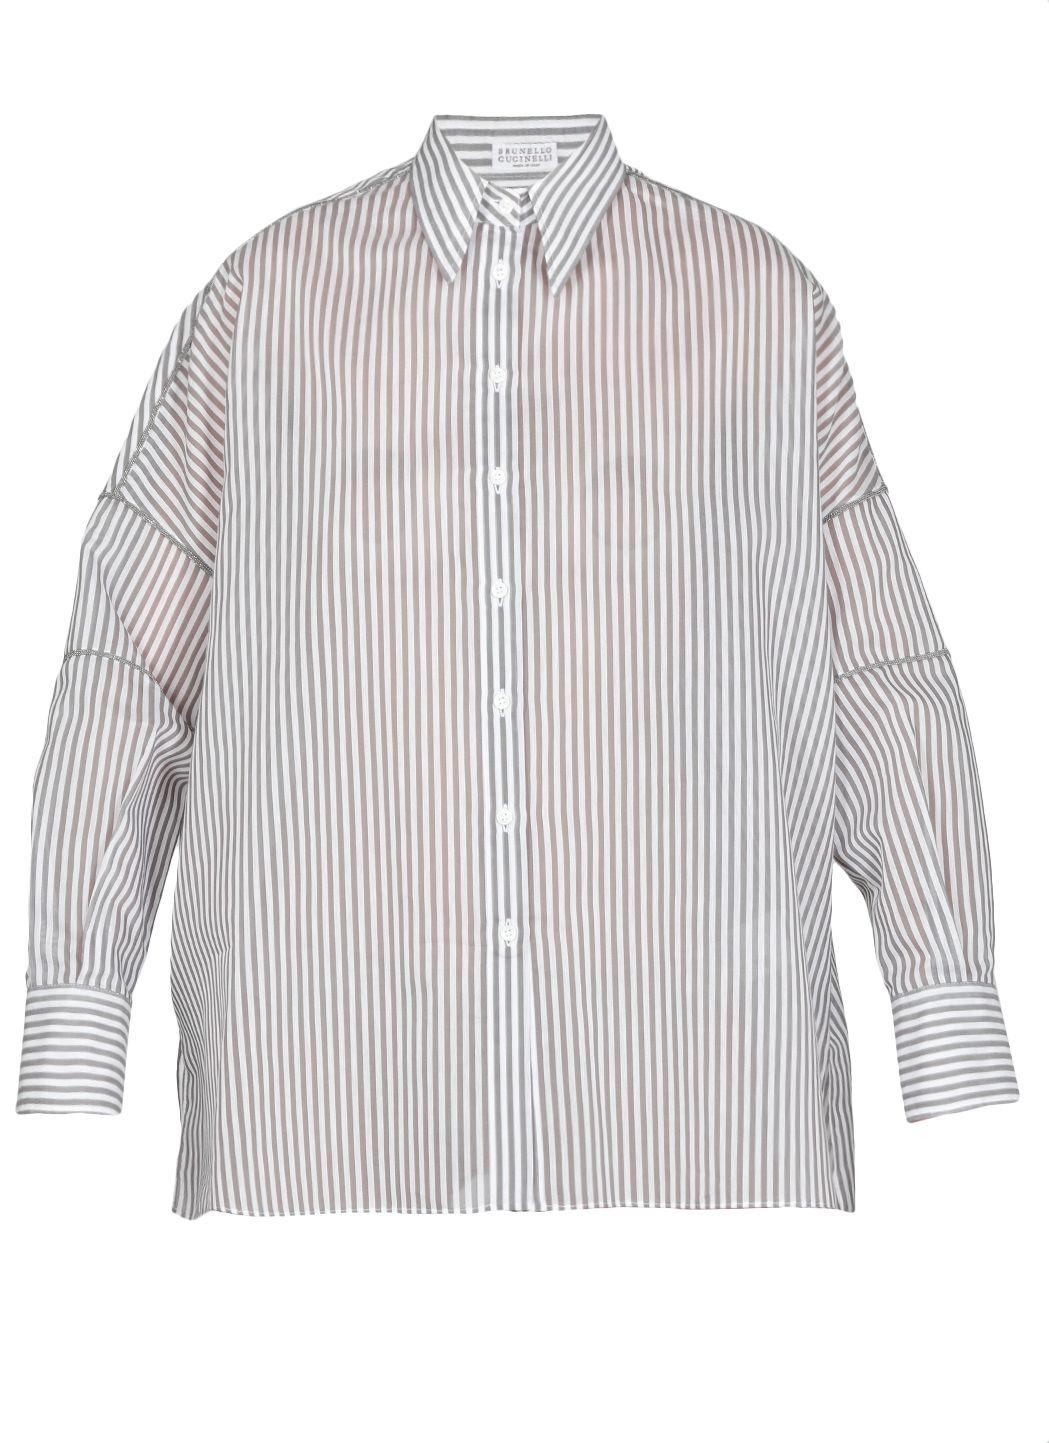 Stretch cotton poplin shirt